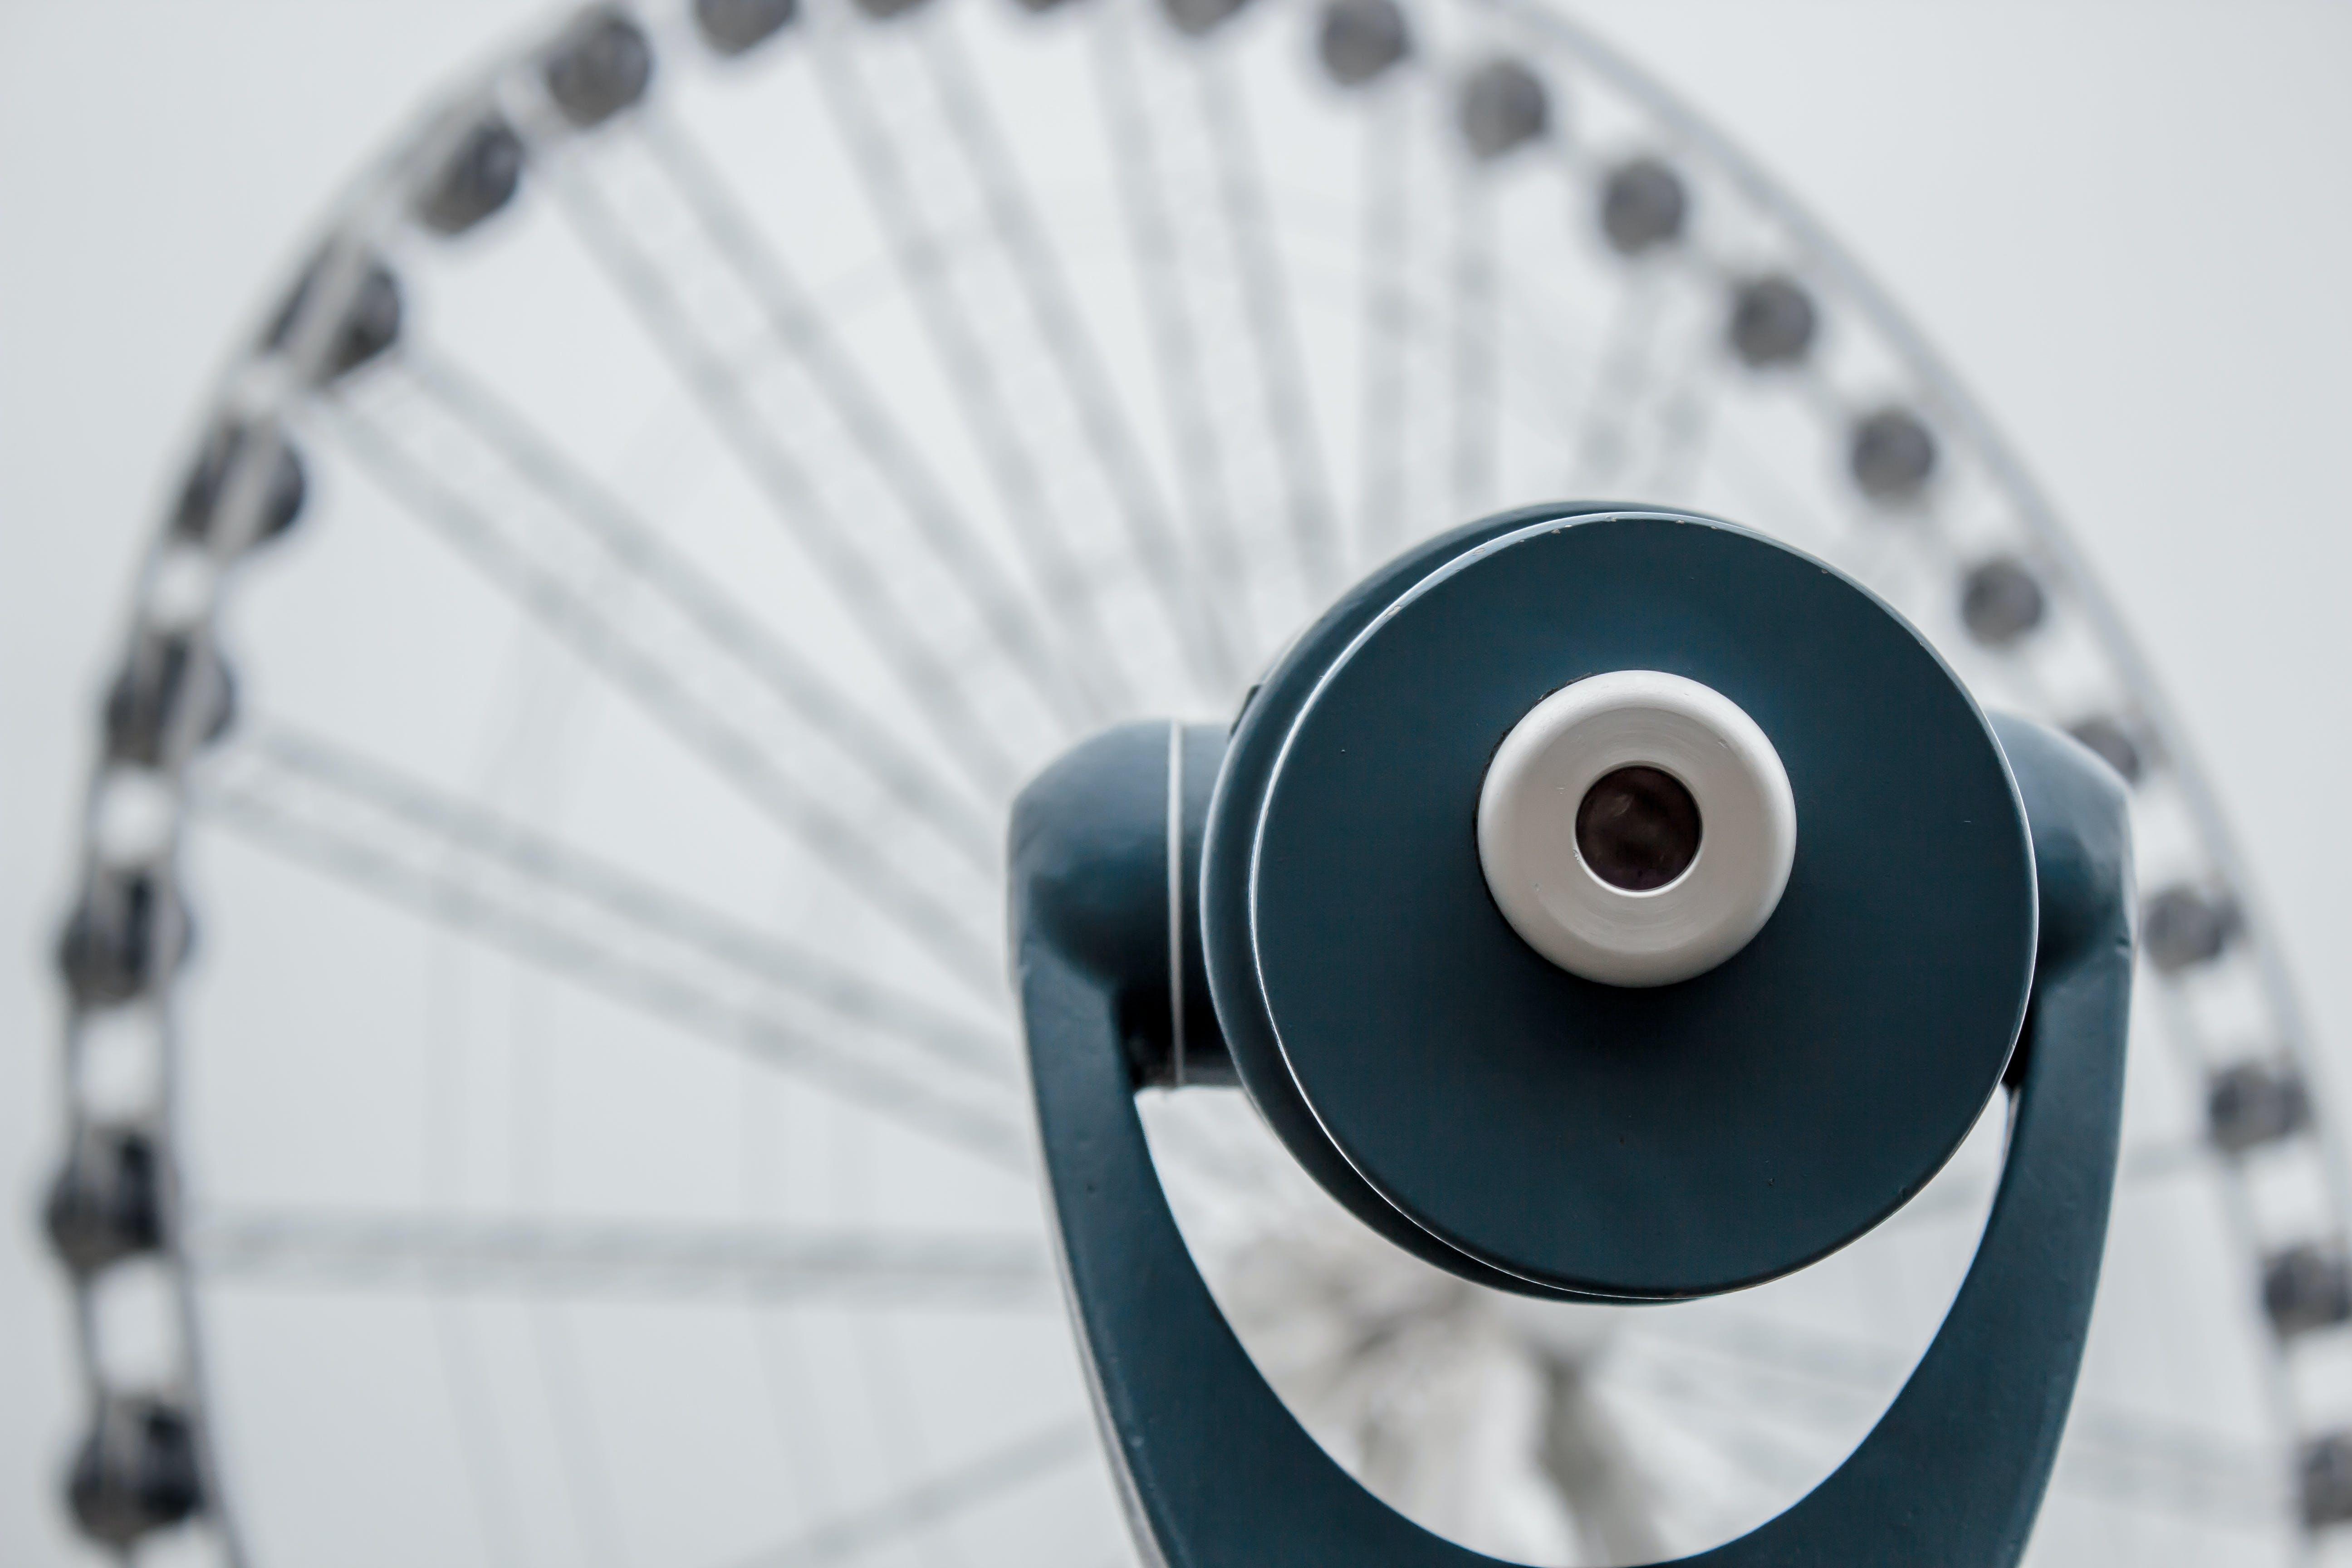 binoculars, circle, ferris wheel